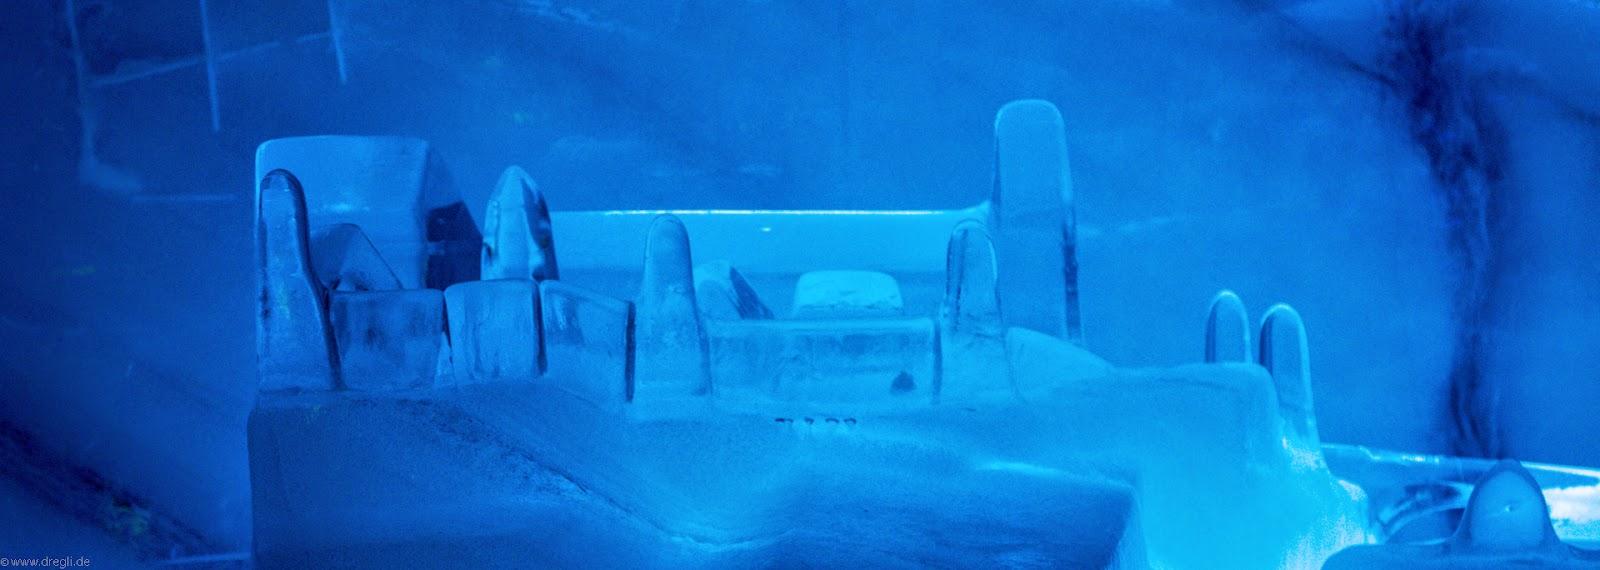 Skulpturen aus Eis 5